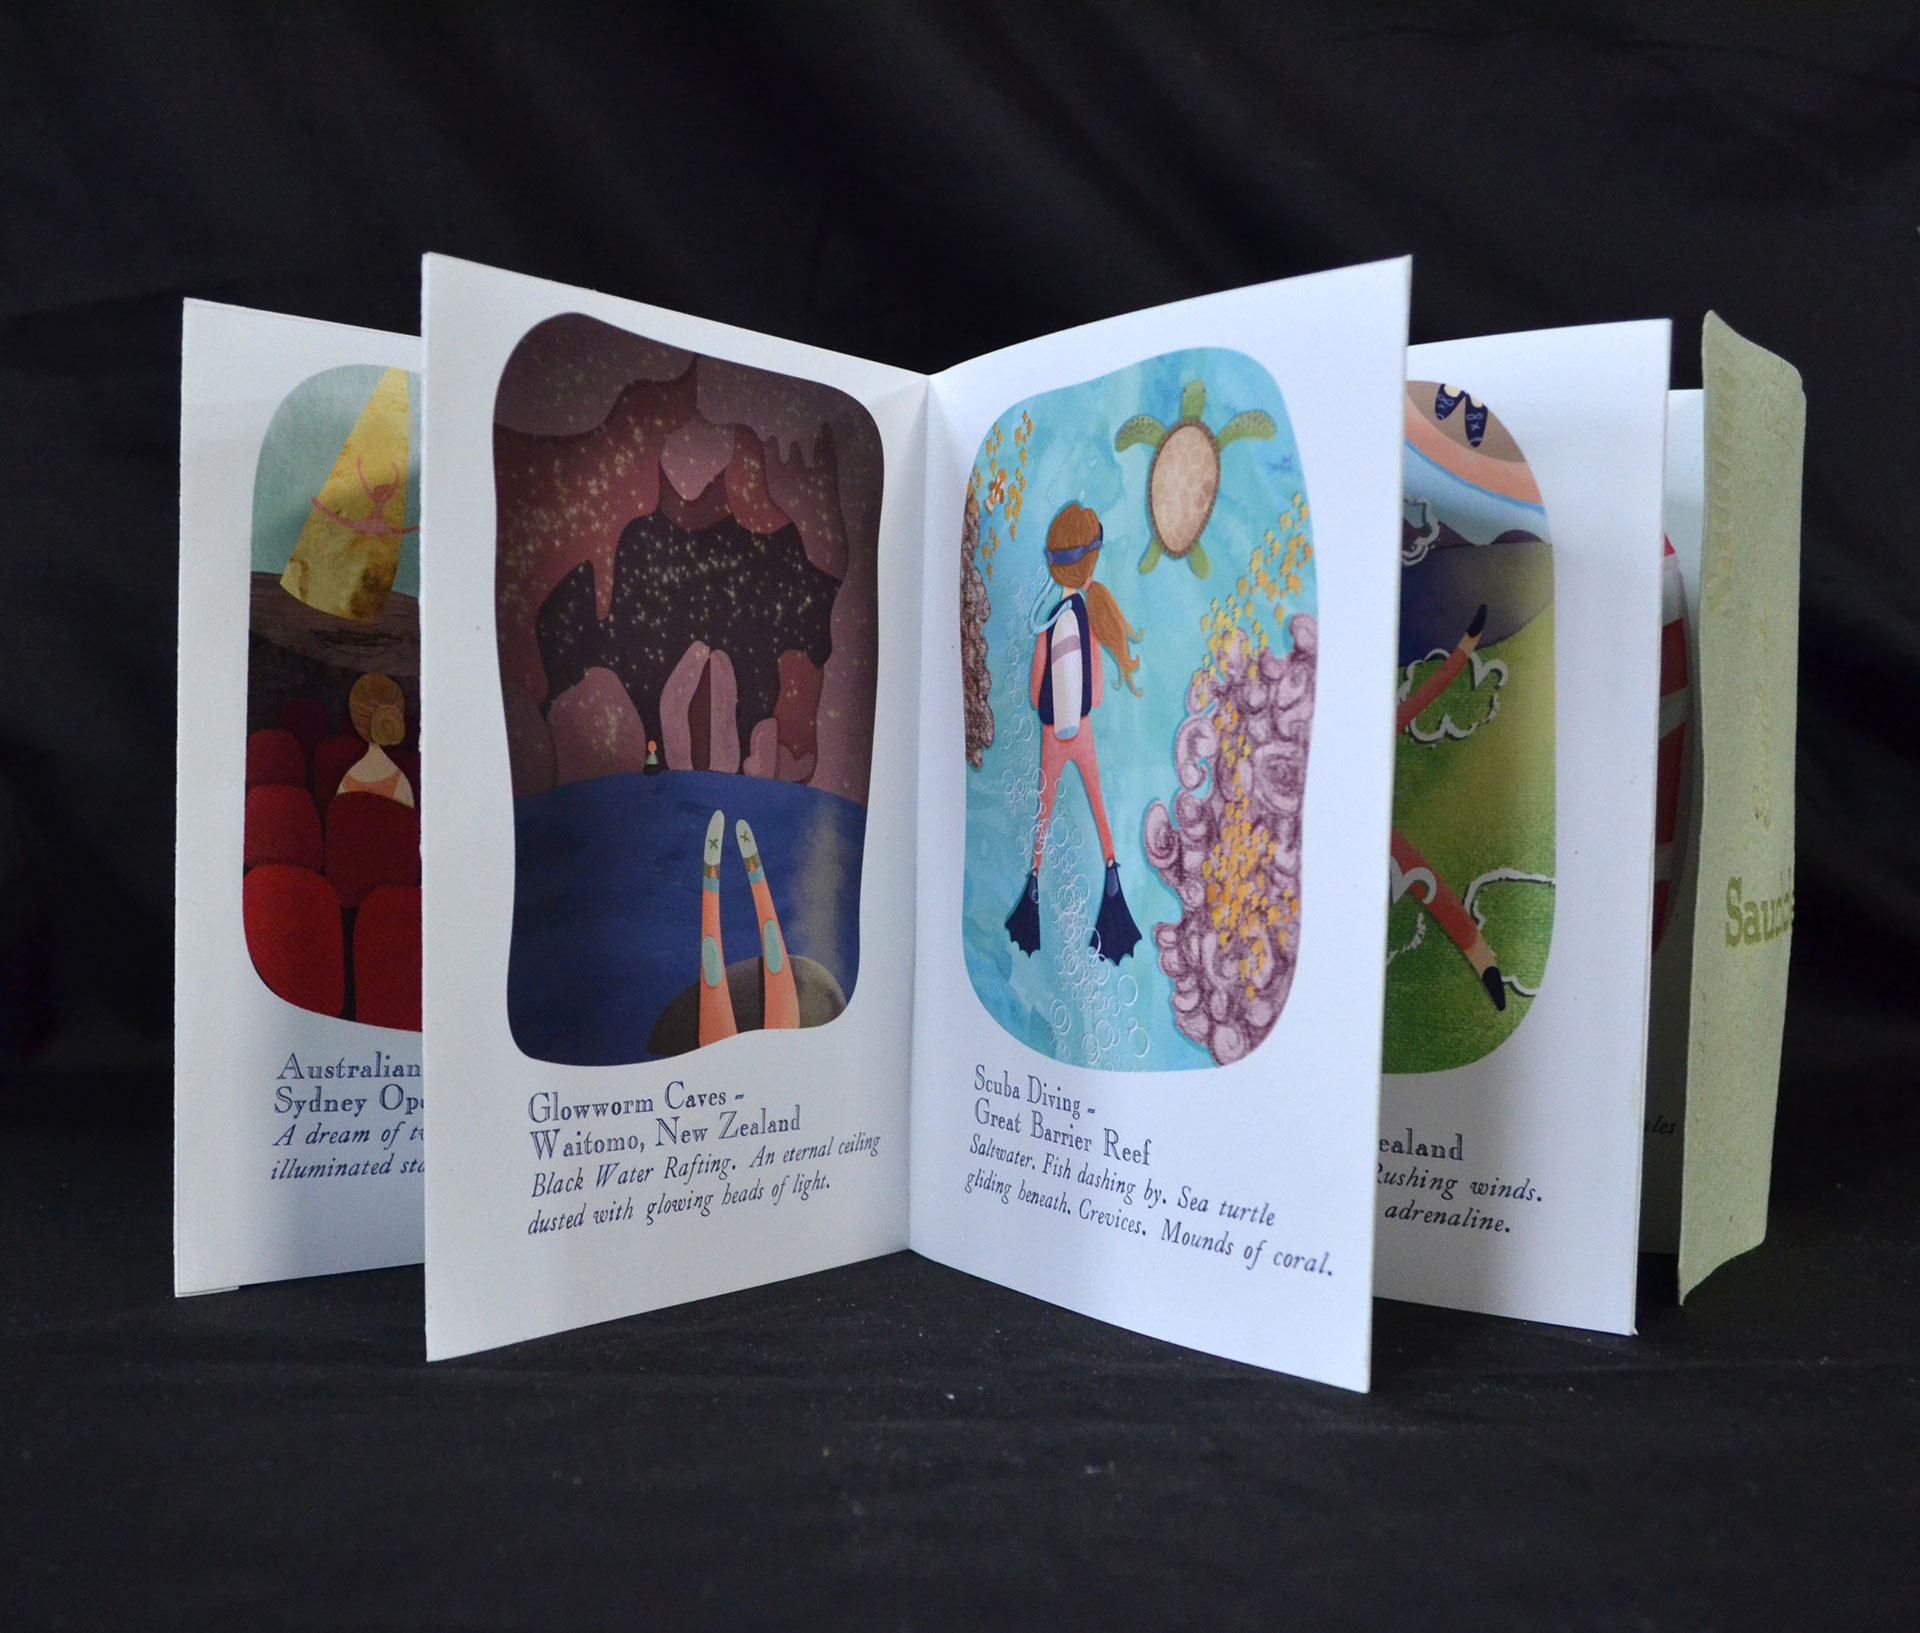 Chesley Jean Chapman Saudade, Letterpress and Digital, 2016